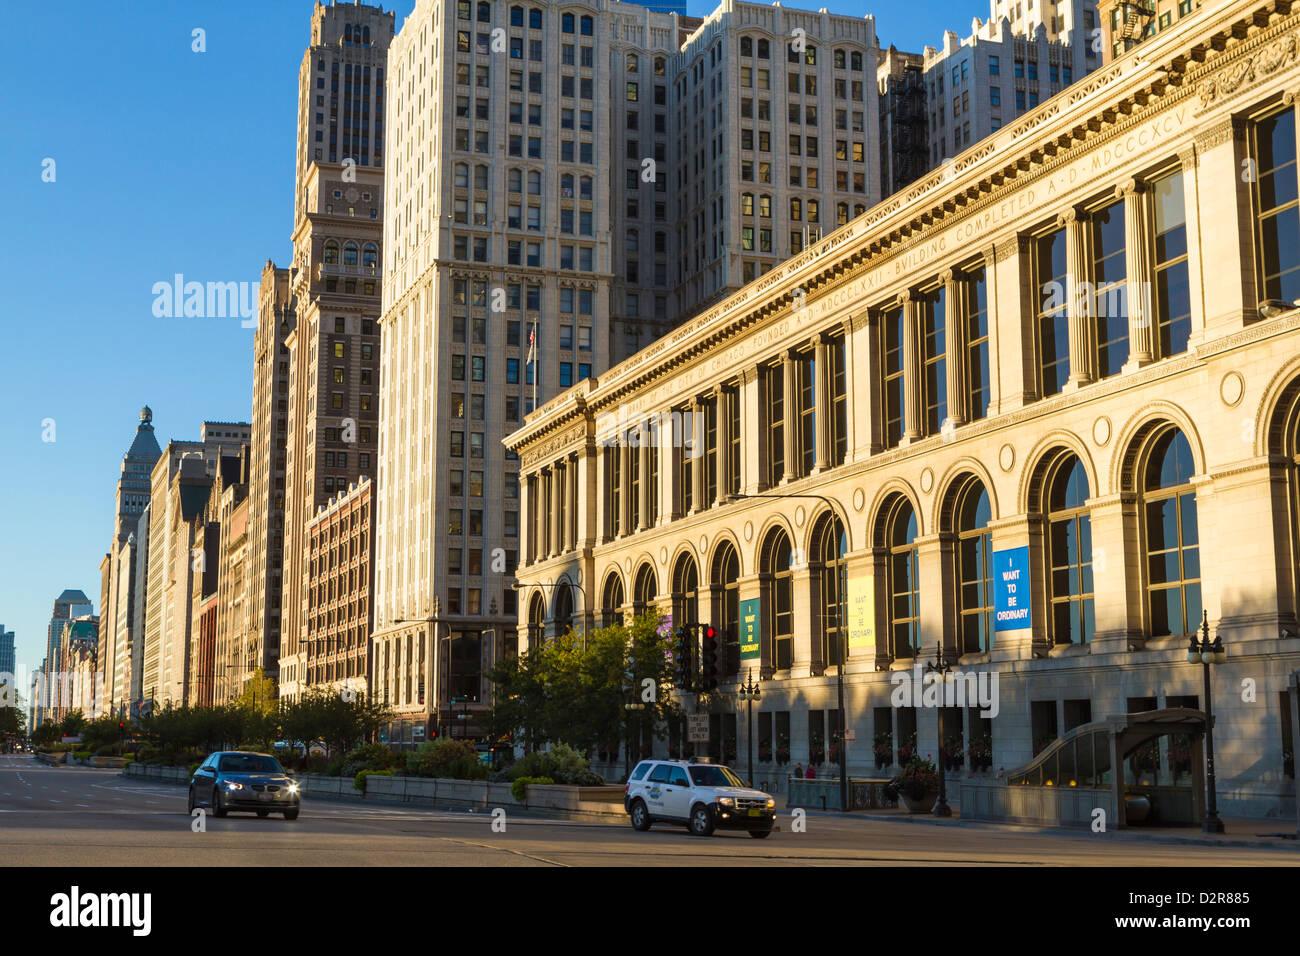 Tall buildings on North Michigan Avenue, Chicago, Illinois, United States of America, North America - Stock Image